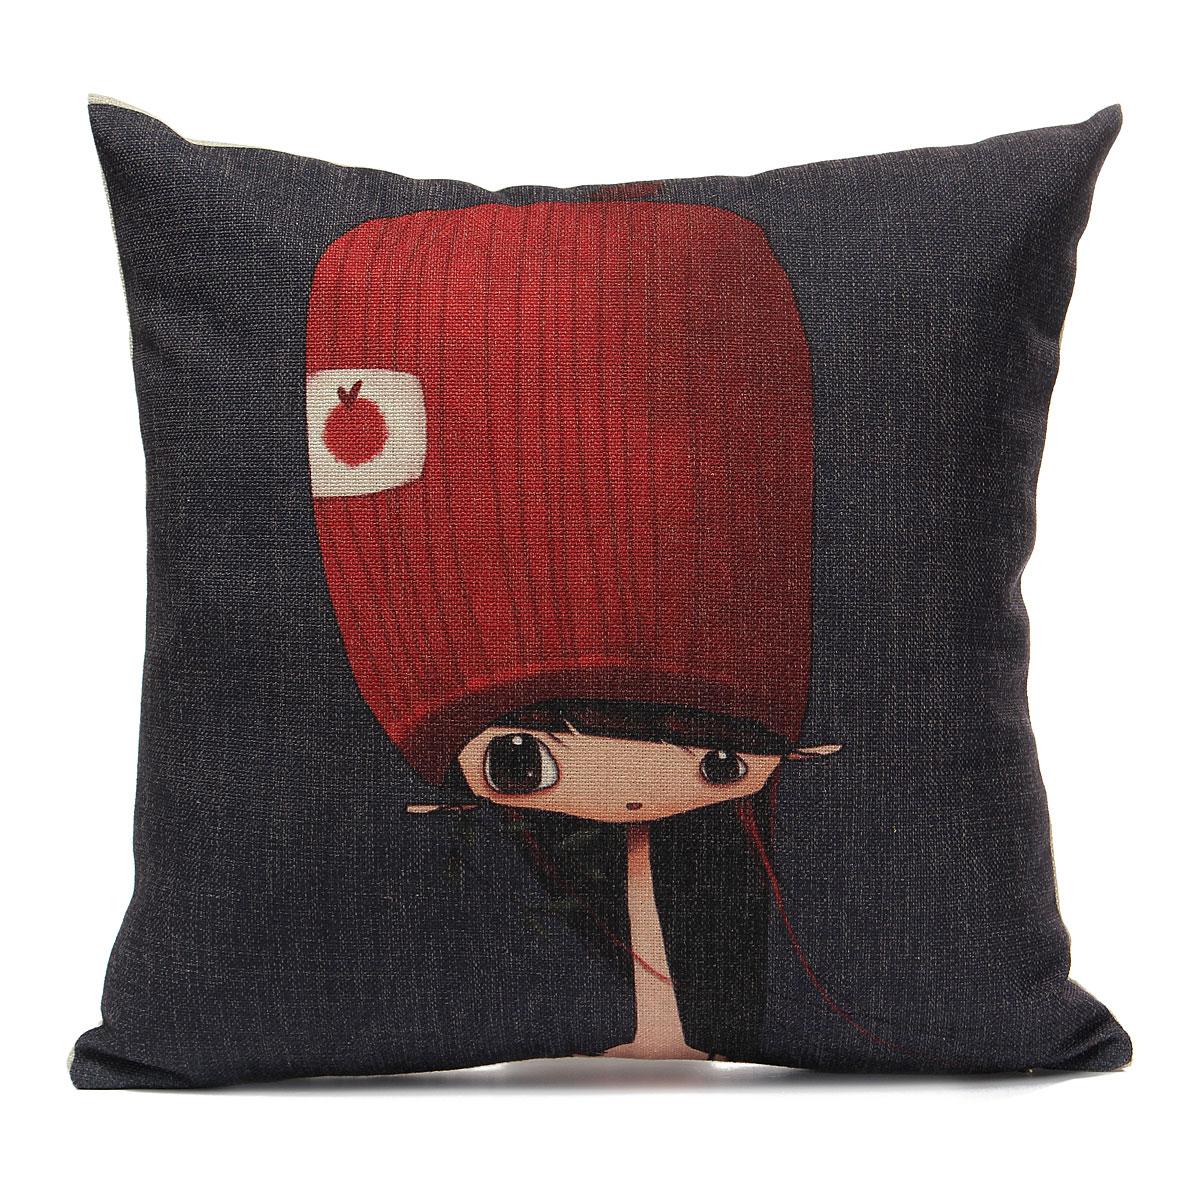 Boys And Girls Pillow Retro Pillow Pillowcase Cotton Linen Cushions Decoration